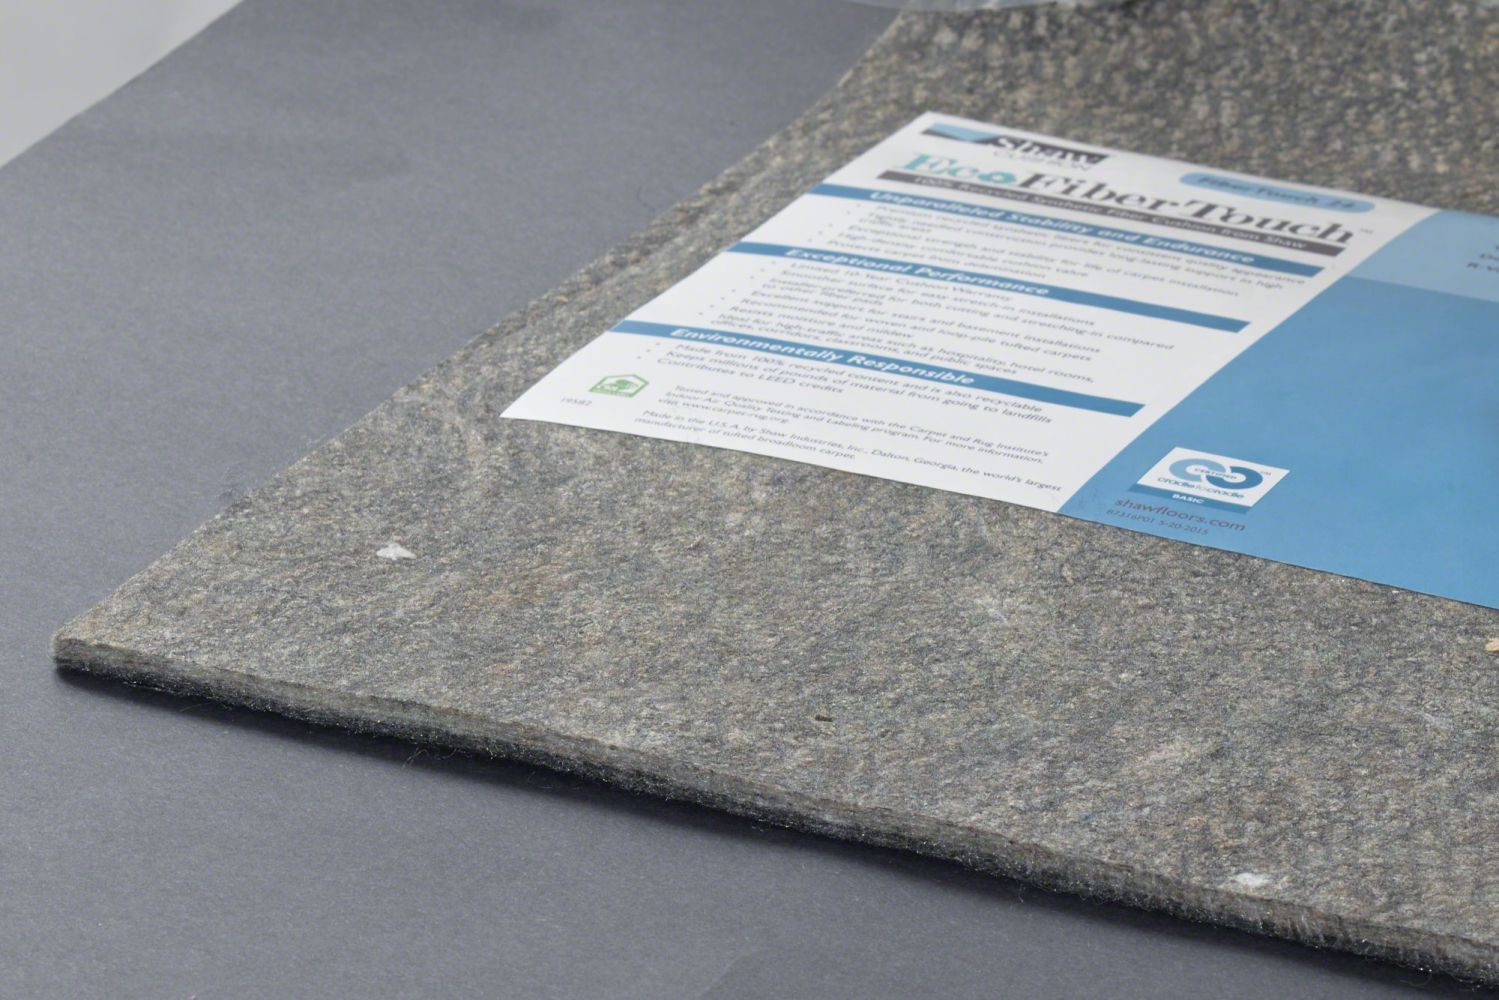 Shaw Floors Eco Edge Cushion Fibertouch 24-6 Grey 00001_270FT